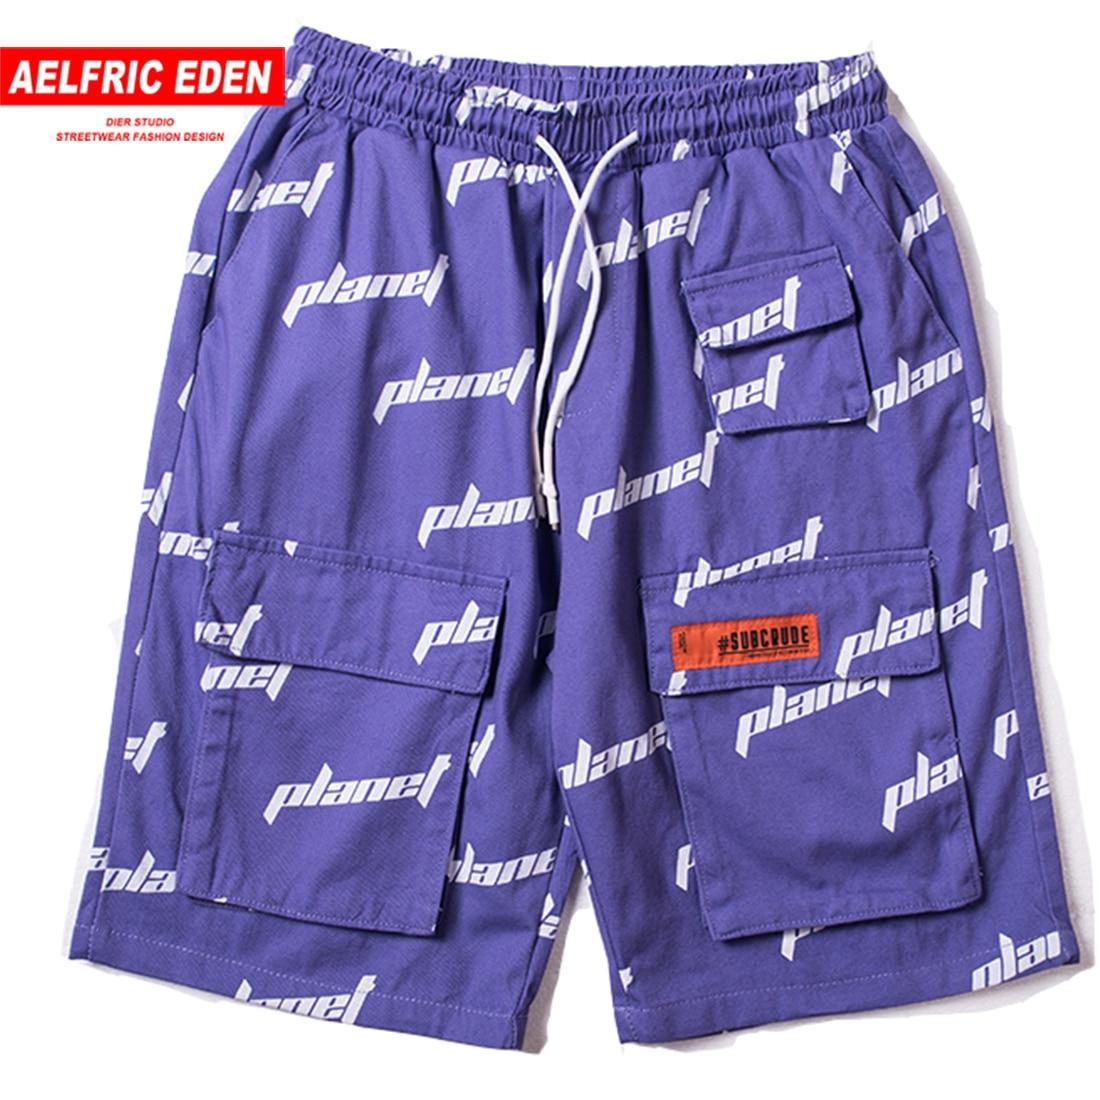 Aelfric Eden Letter Full Print Fashion Short Jogger 2019 Hip Hop Shorts Summer Casual Streetwear Drawstring Cargo Knee Length